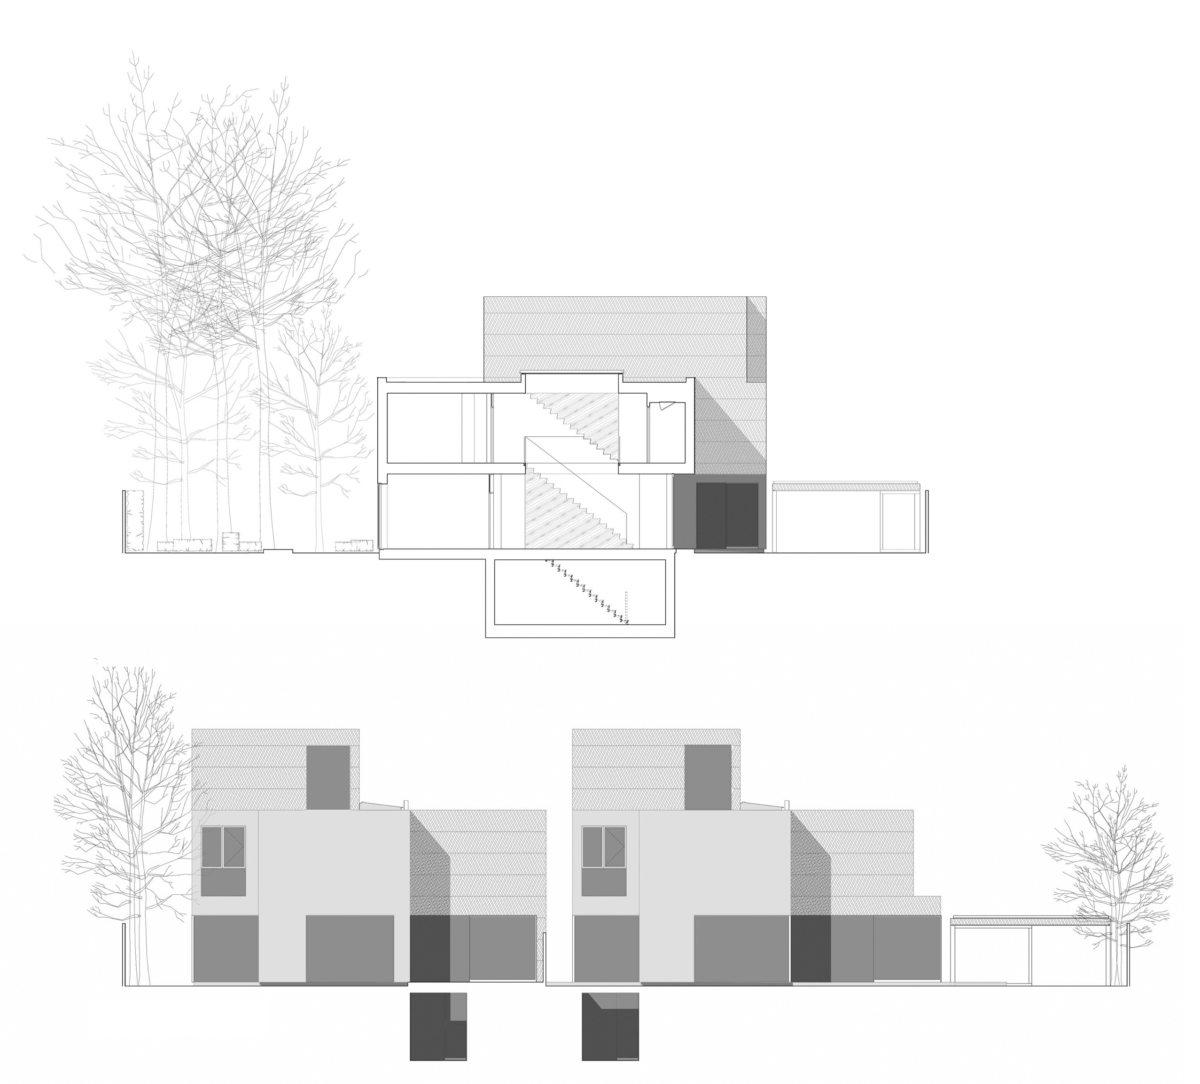 Alison Brooks Architects _ Herringbone Houses _ Sections Elevations 2